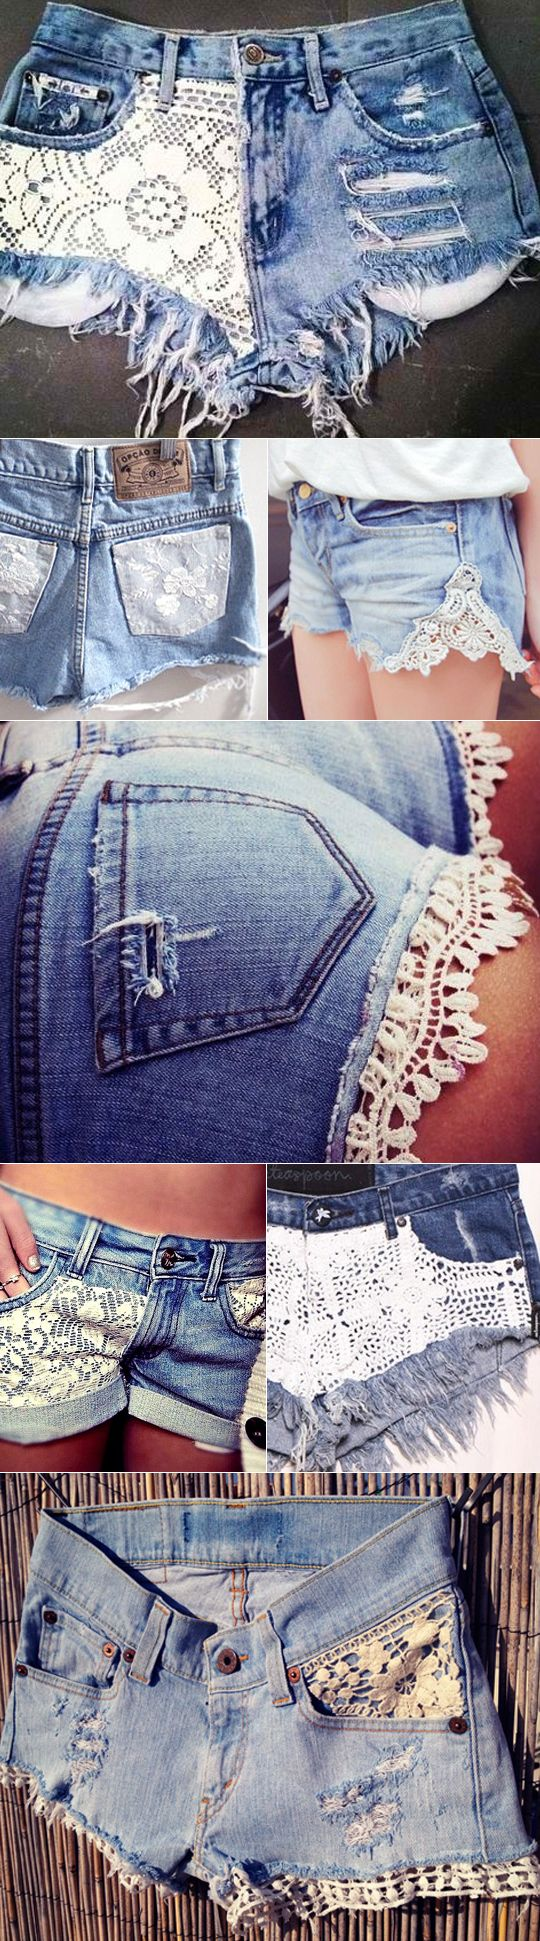 DIY lace crafts